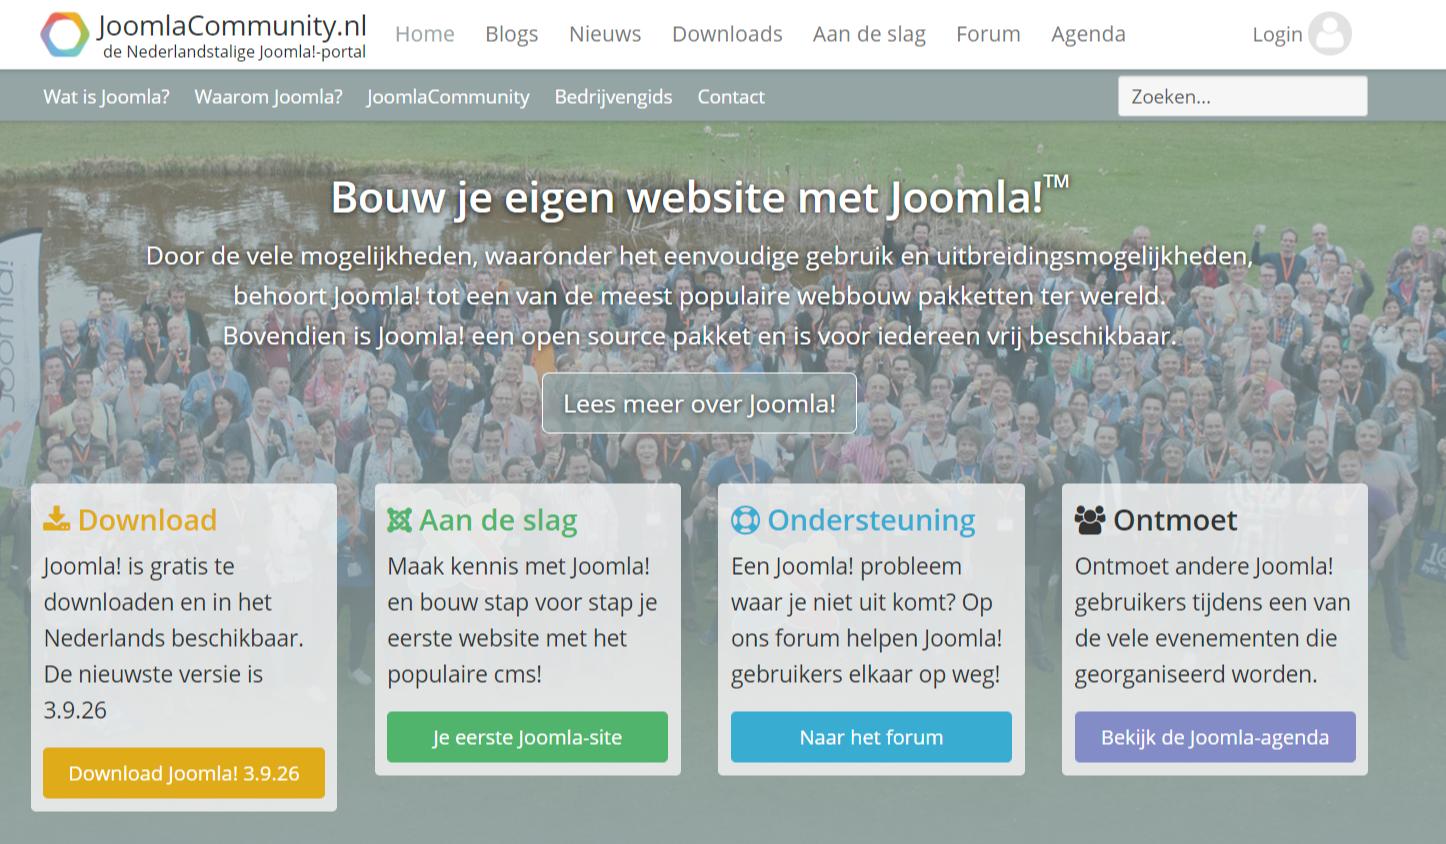 Voorbeeld community JoomlaCommunity.nl